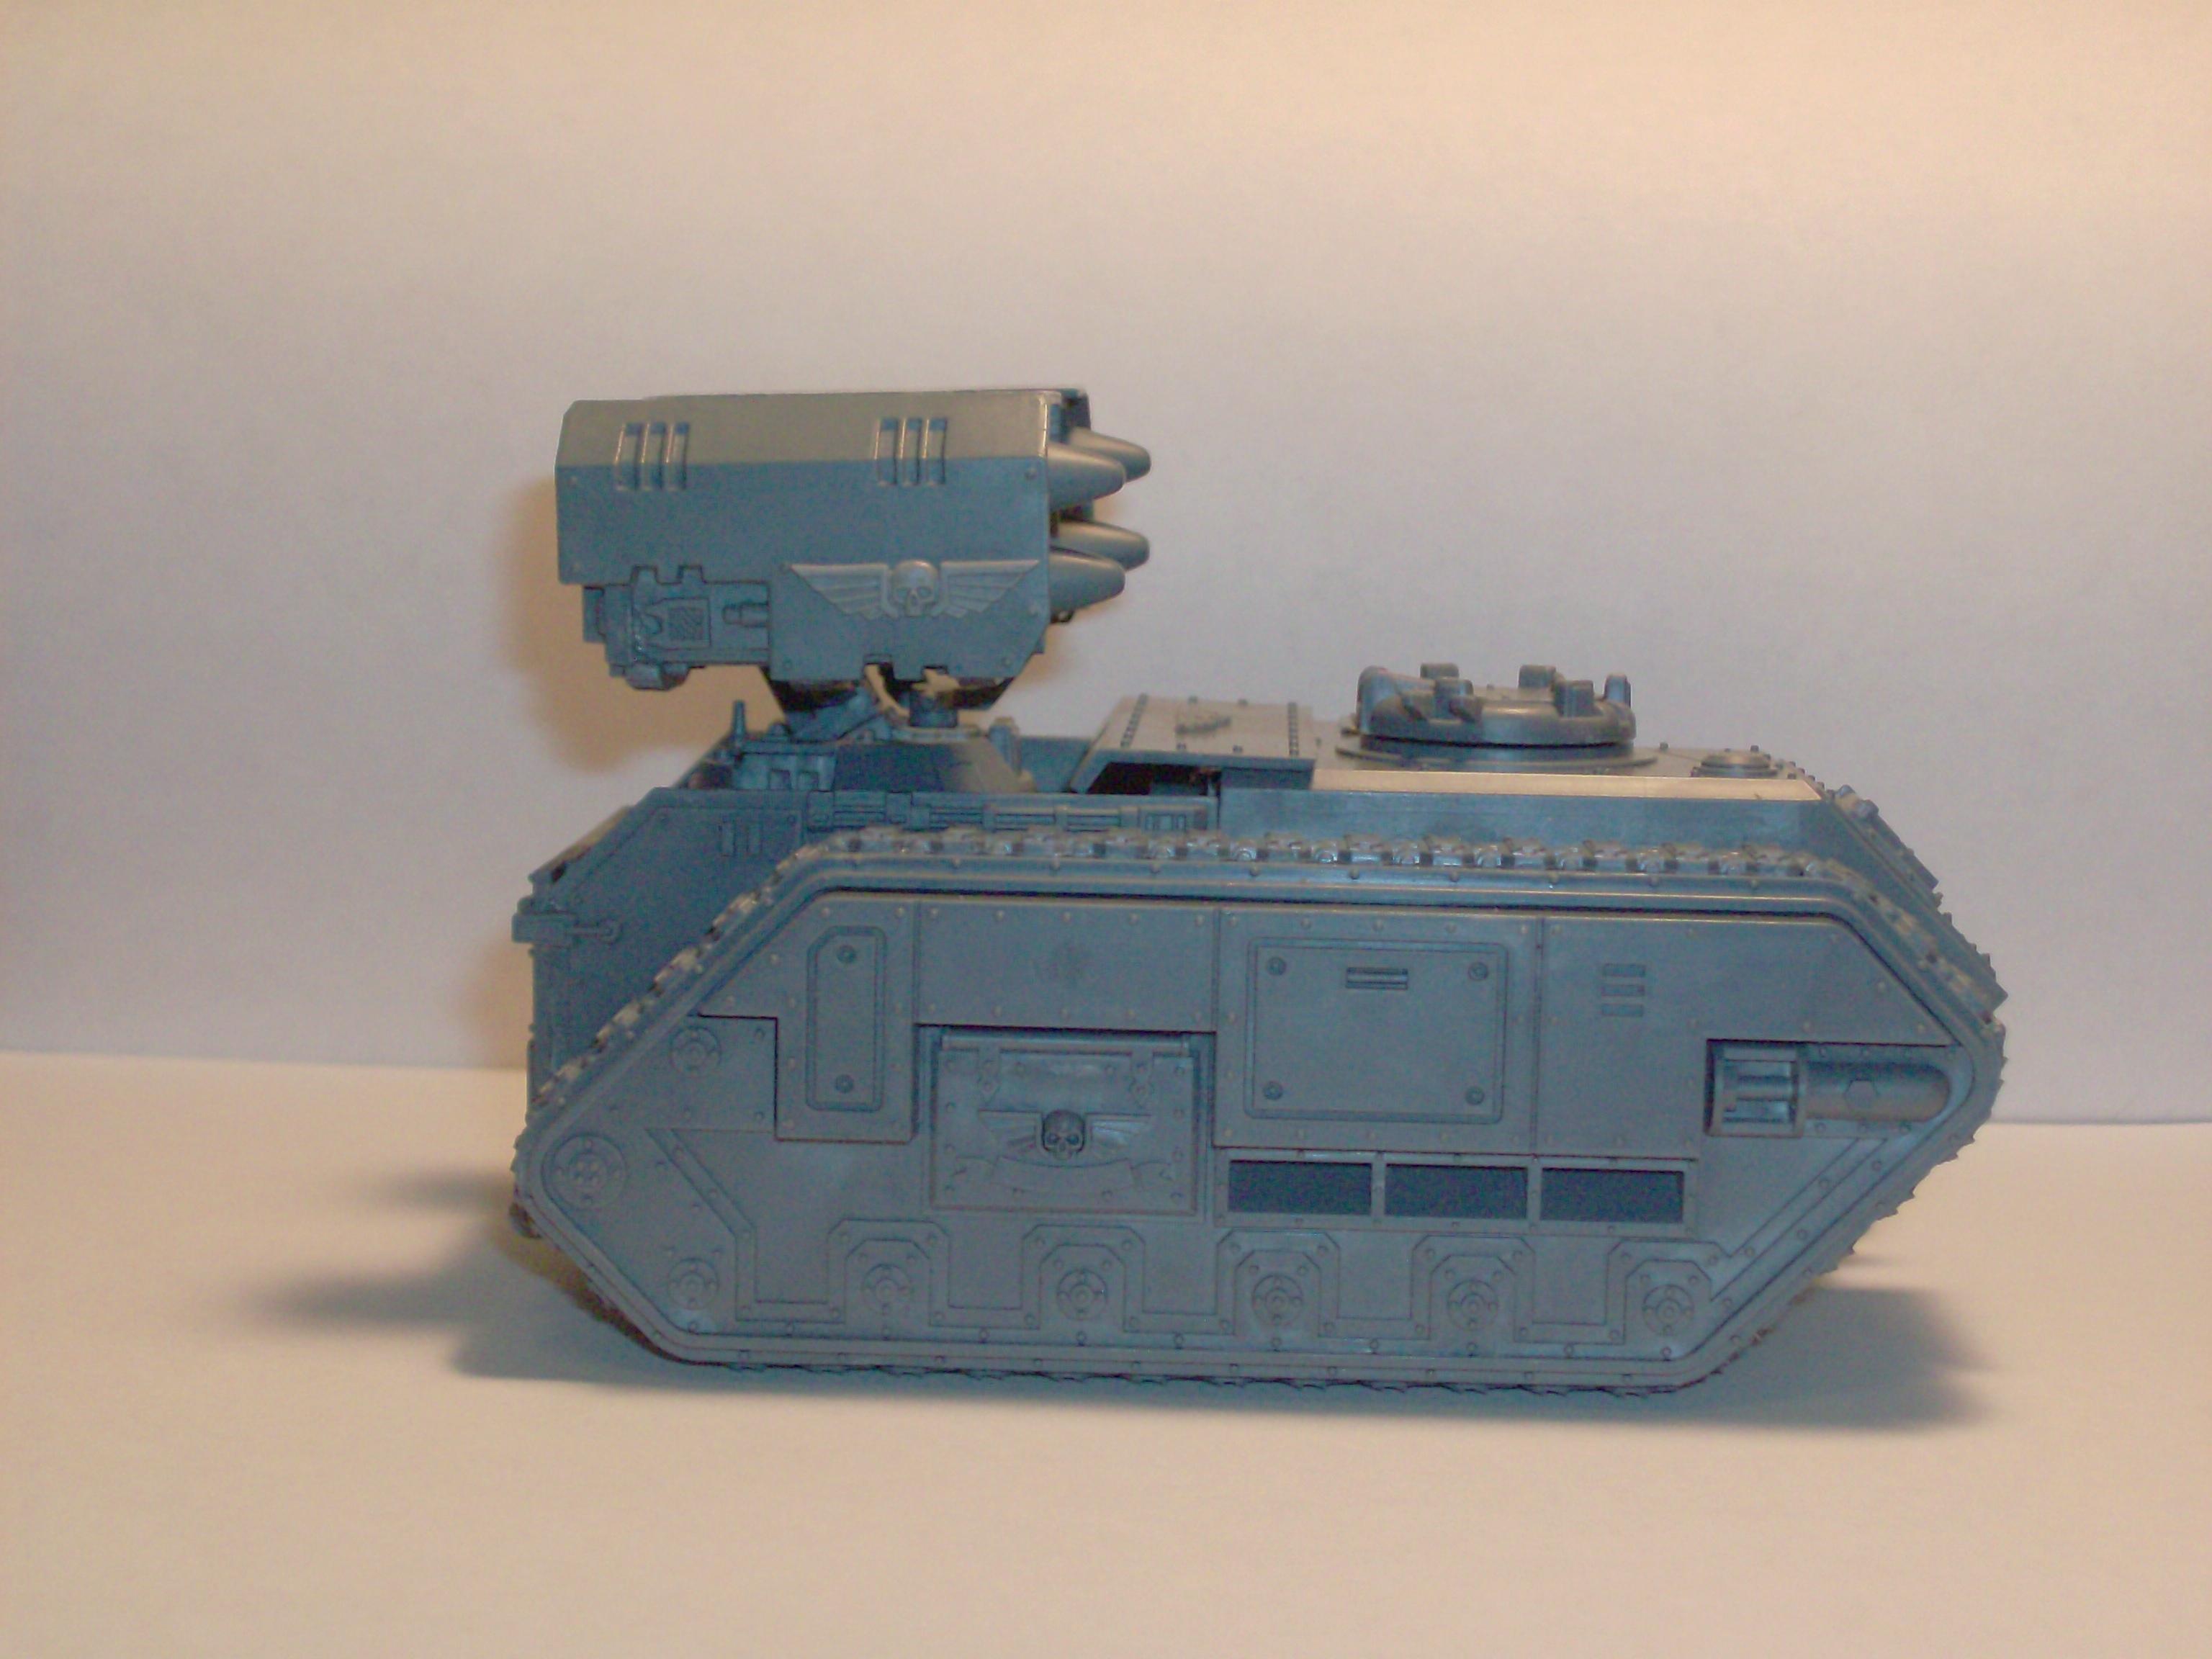 Imperial Guard, Tank, Warhammer 40,000, Work In Progress